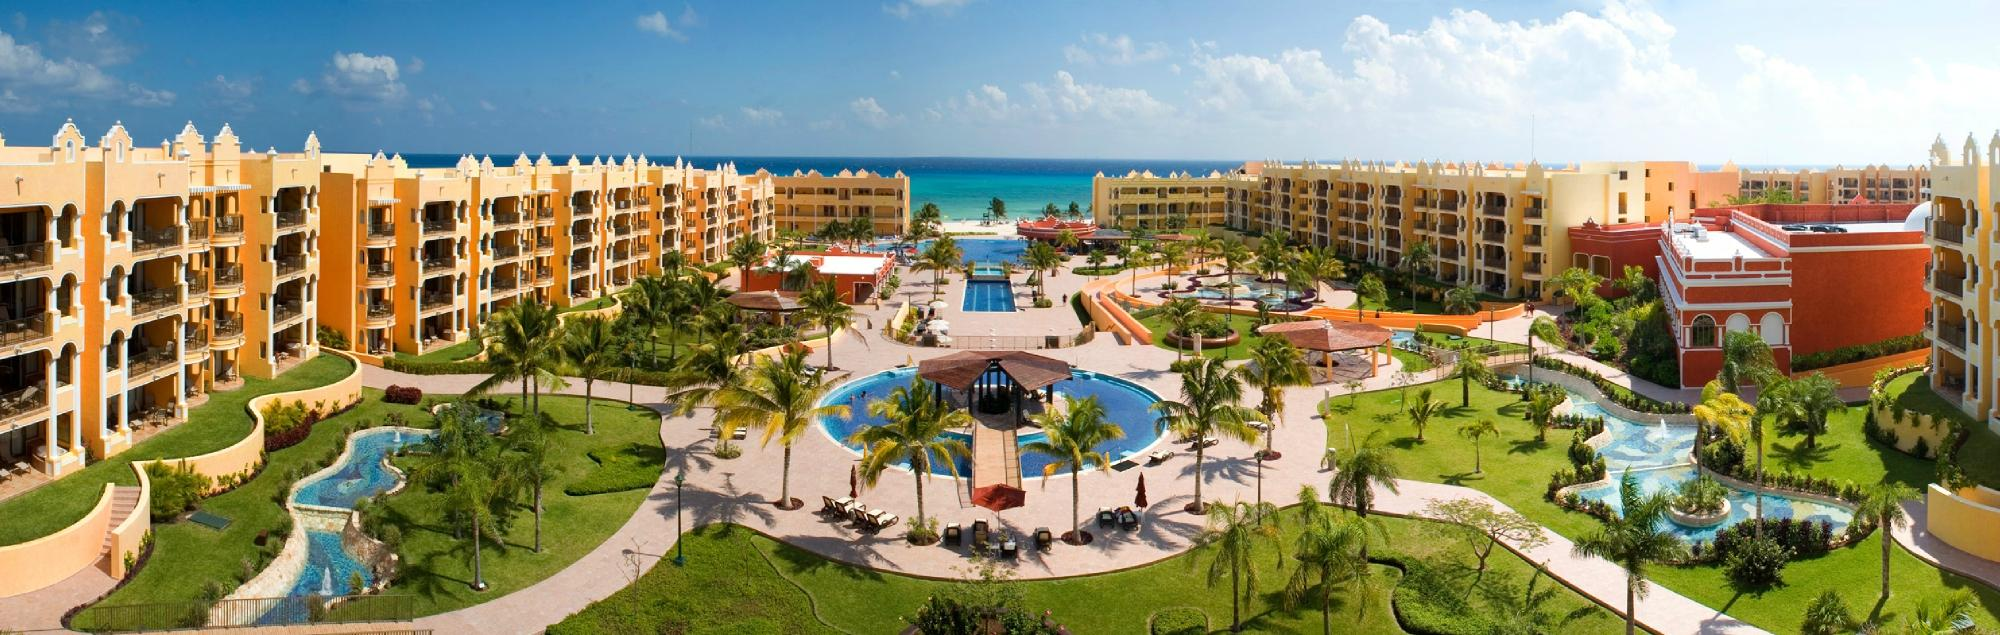 The royal haciendas all suites resort amp spa playa del carmen riviera